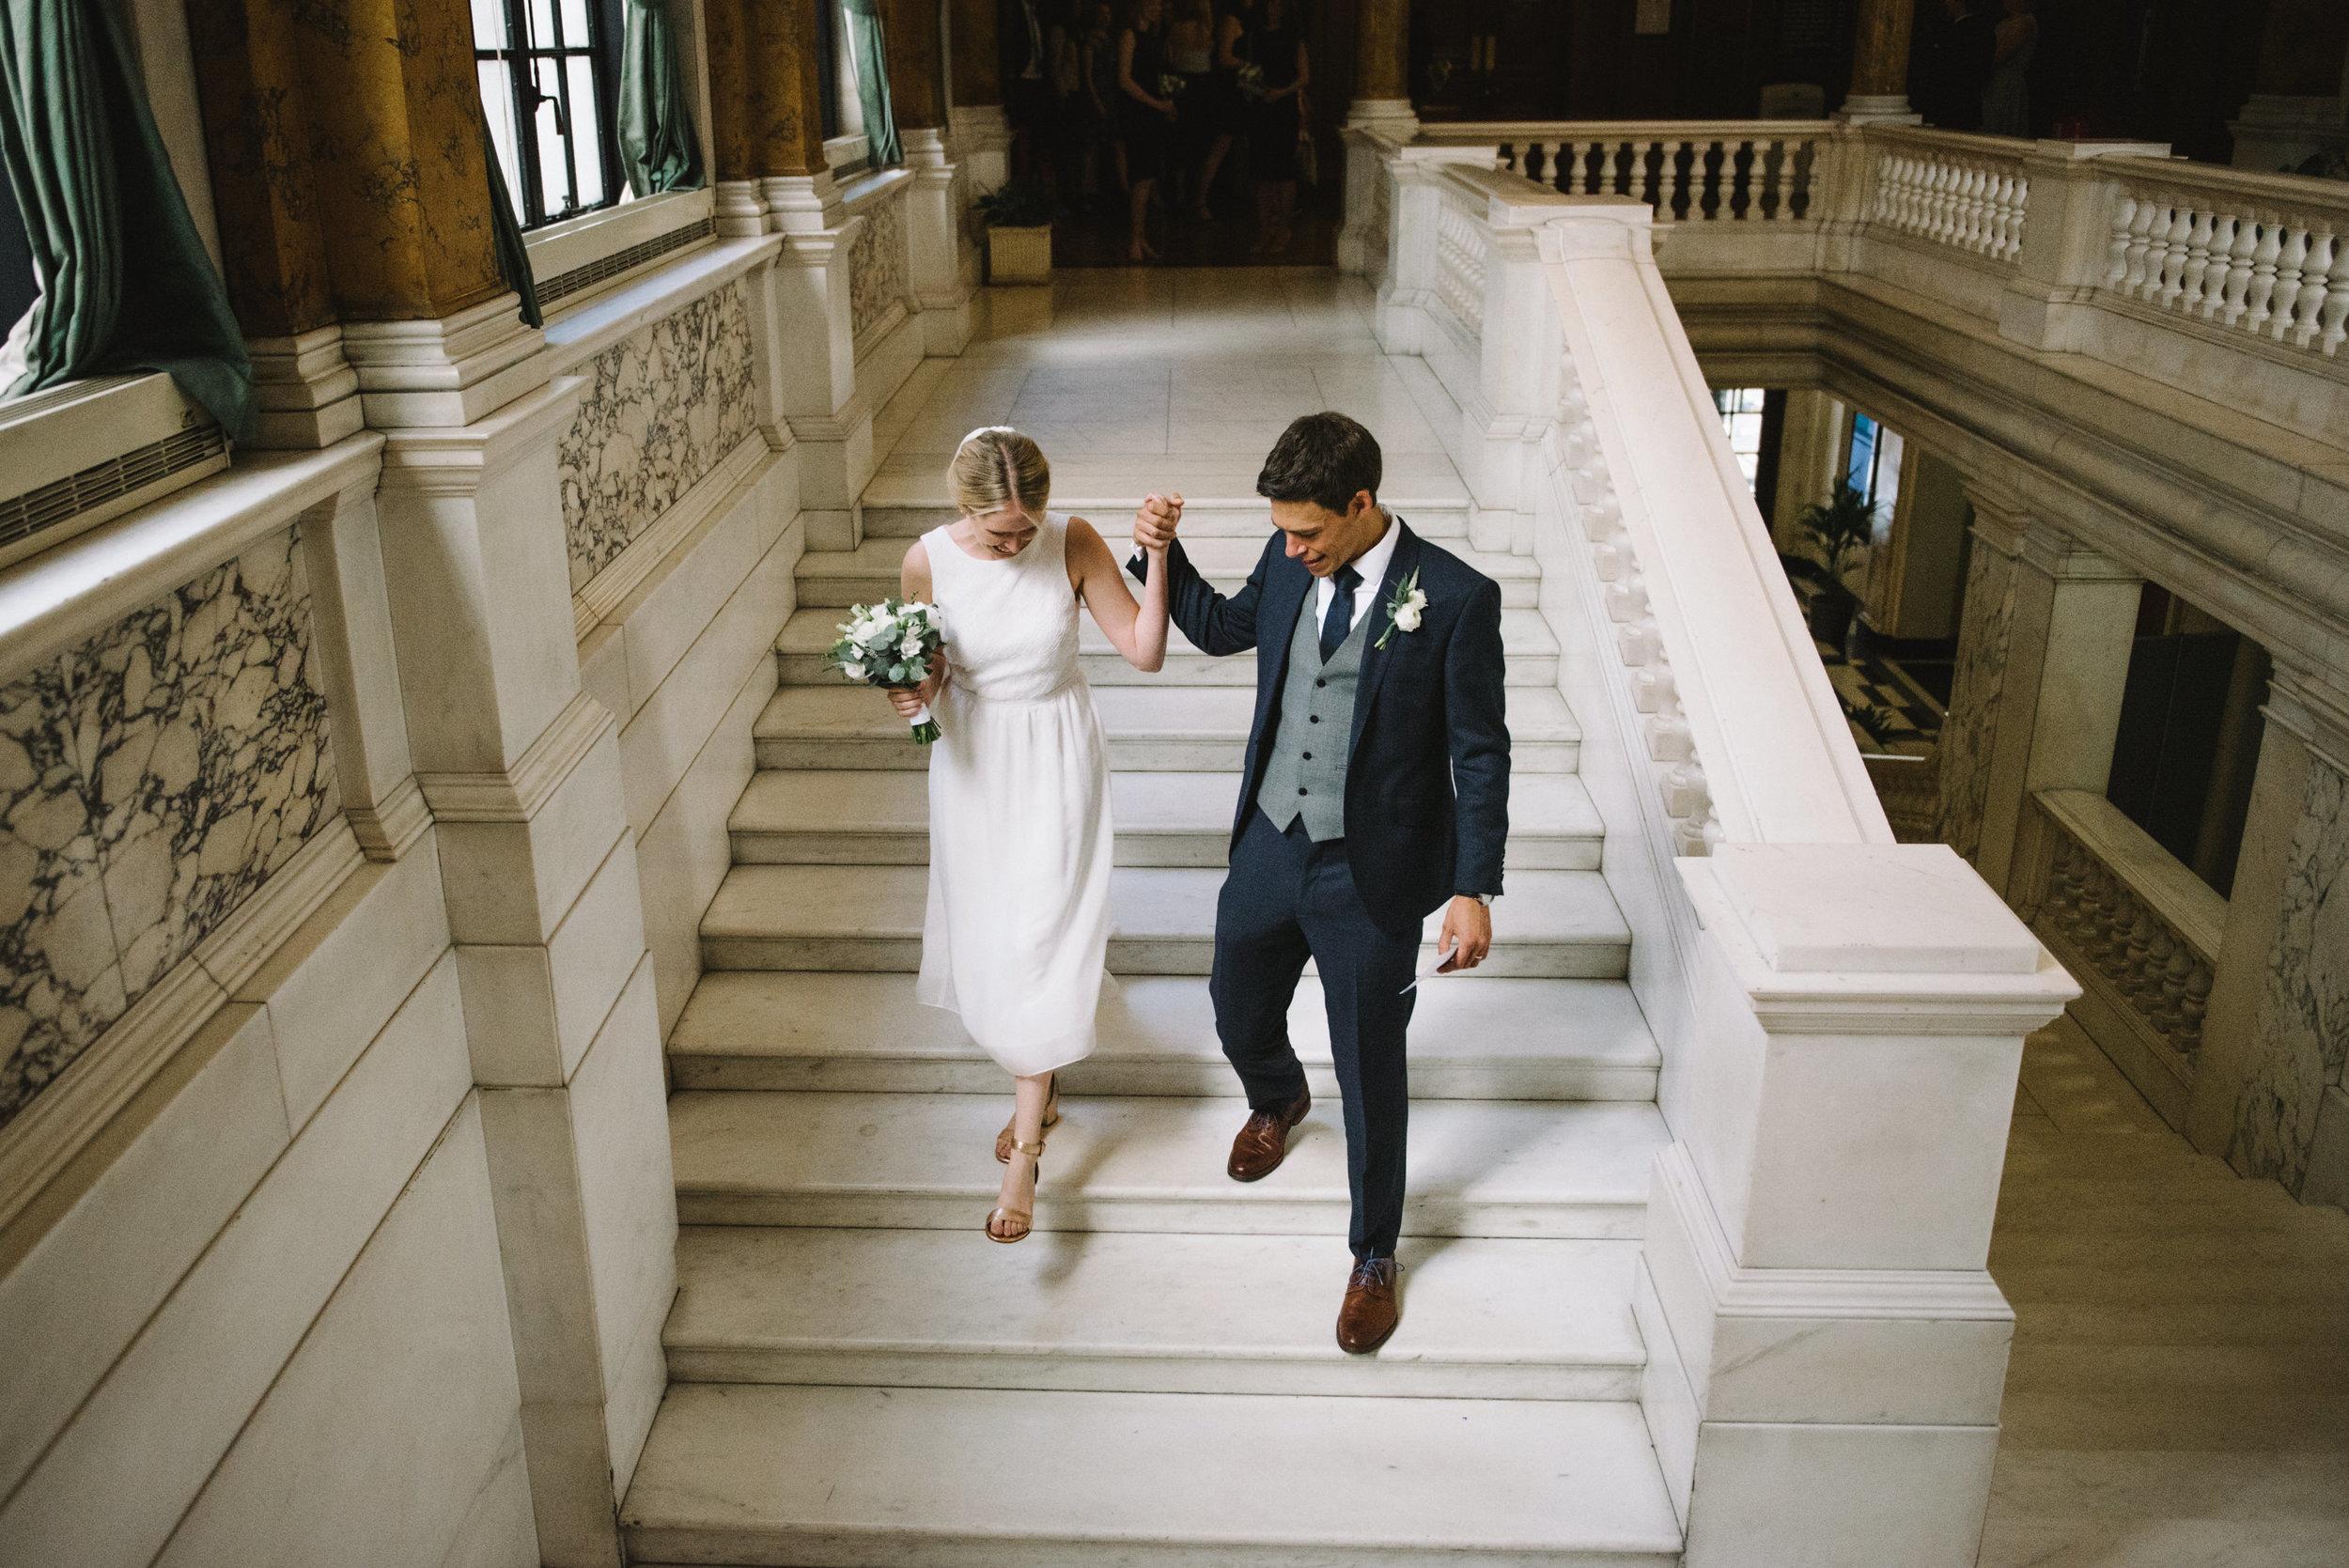 0183-LISA-DEVINE-PHOTOGRAPHY-ALTERNATIVE-WEDDING-PHOTOGRAPHY-SCOTLAND-DESTINATION-WEDDINGS-GLASGOW-WEDDINGS-COOL-WEDDINGS-STYLISH-WEDDINGS.JPG